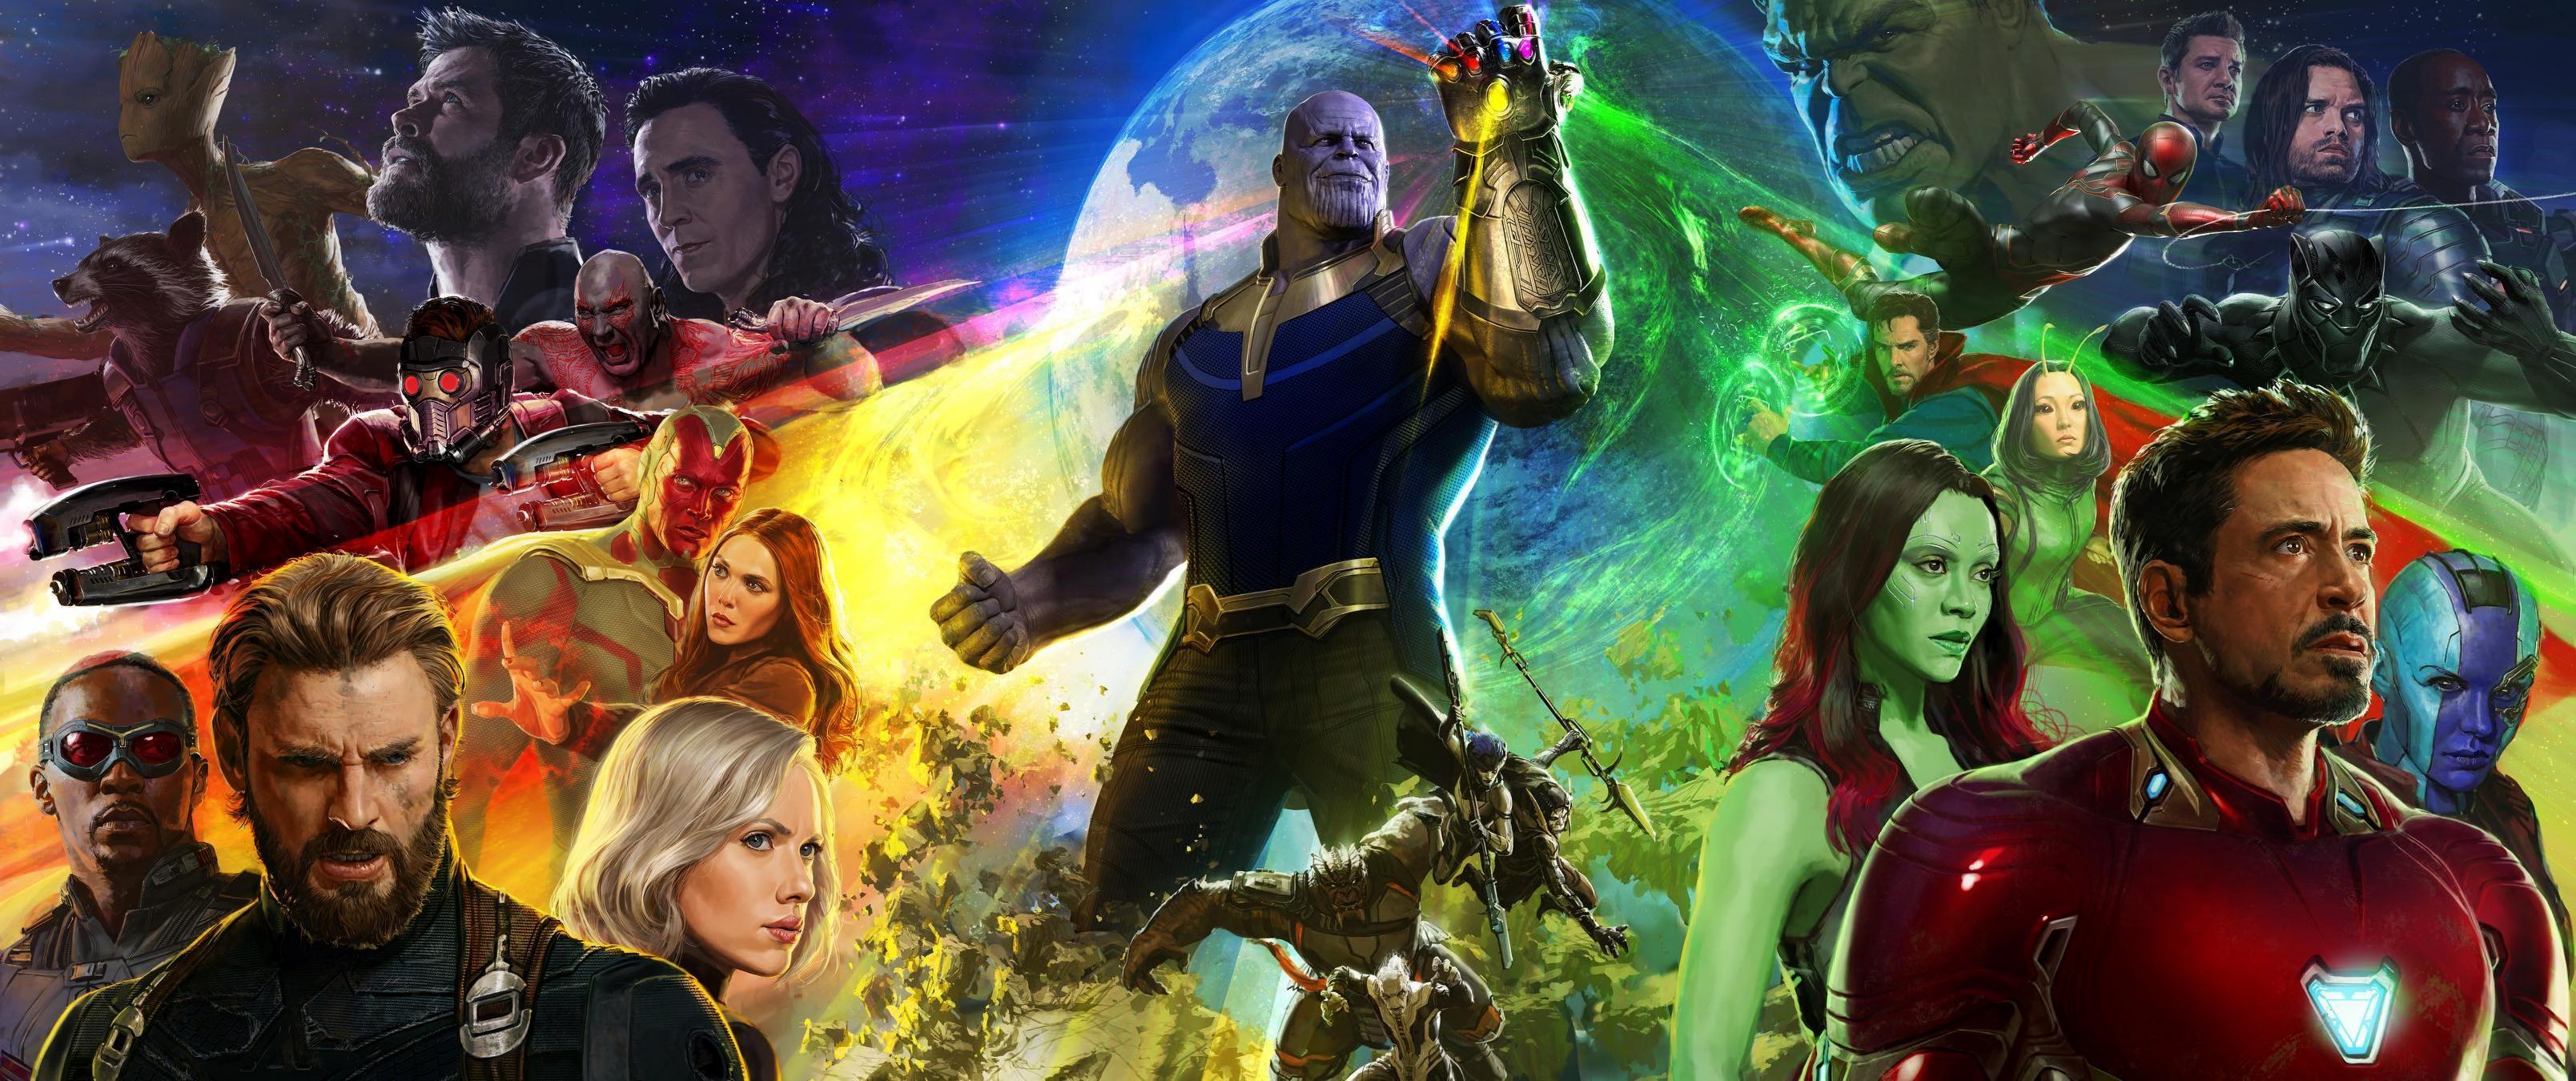 1366x768 Avengers Infinity War 2018 4k 1366x768 Resolution Hd 4k